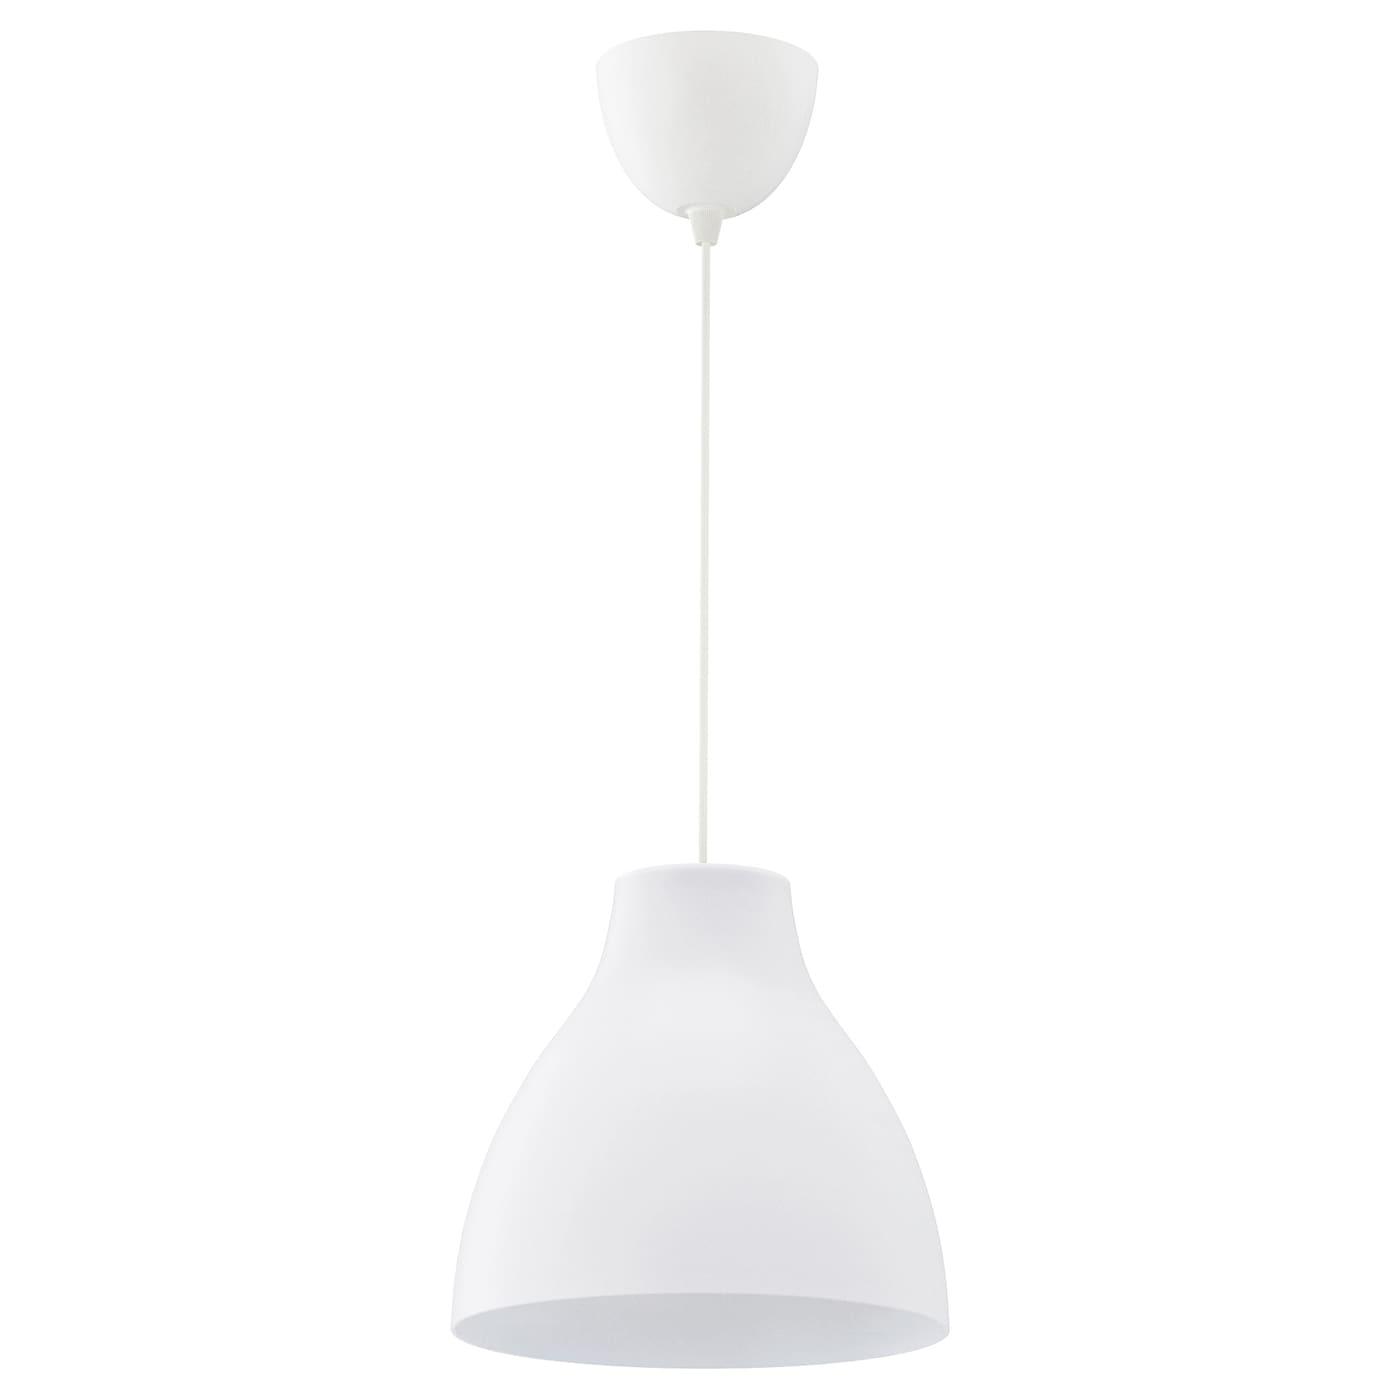 Melodi Lampara De Techo Blanco 28 Cm Ikea